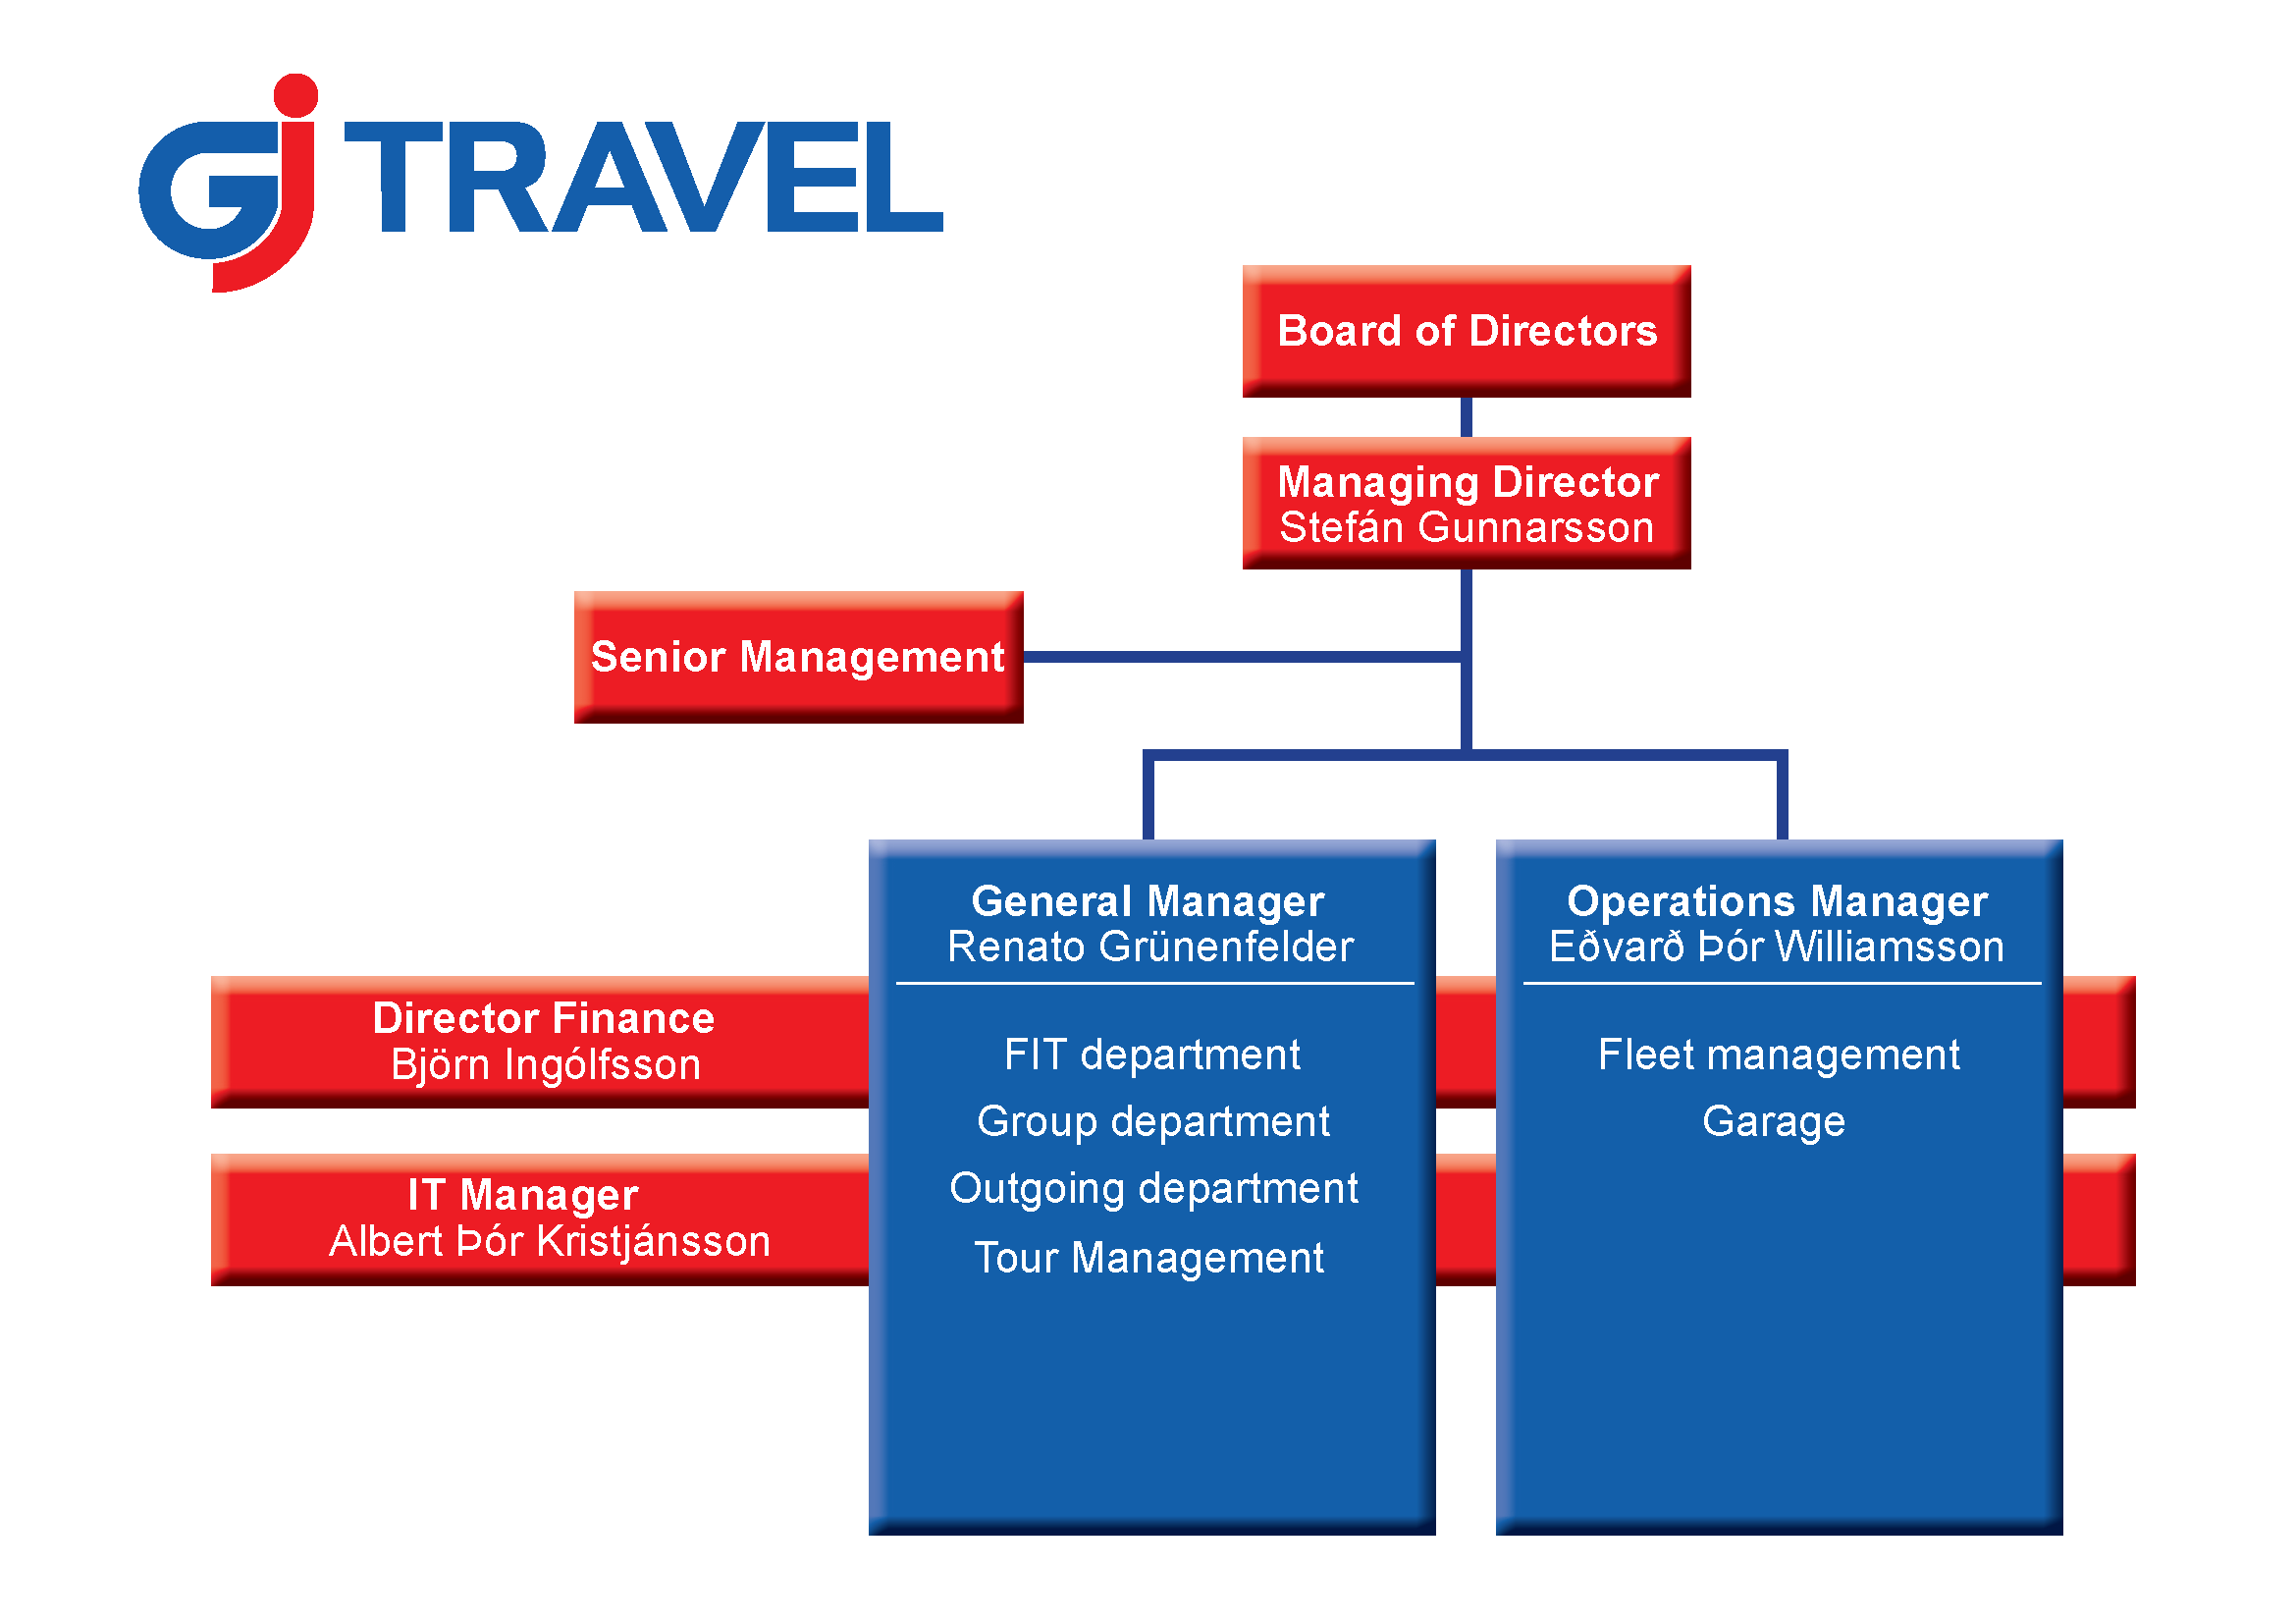 GJ Travel Organization chart